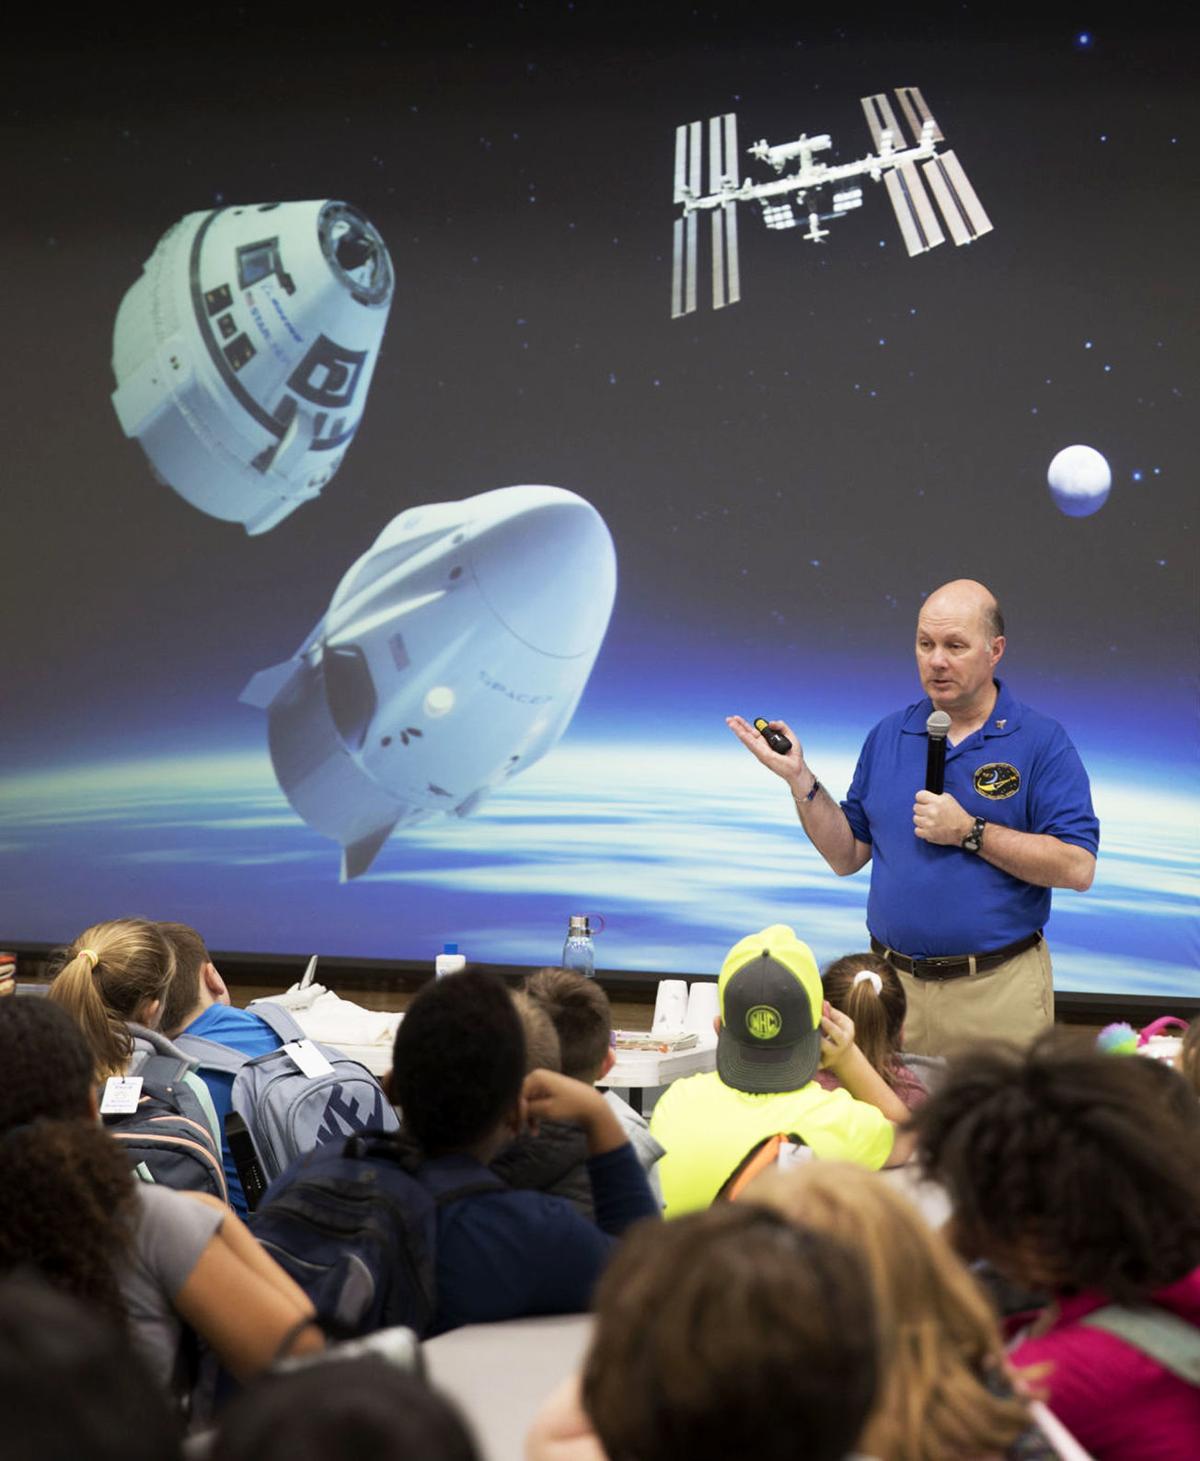 Shuttle picture.JPG